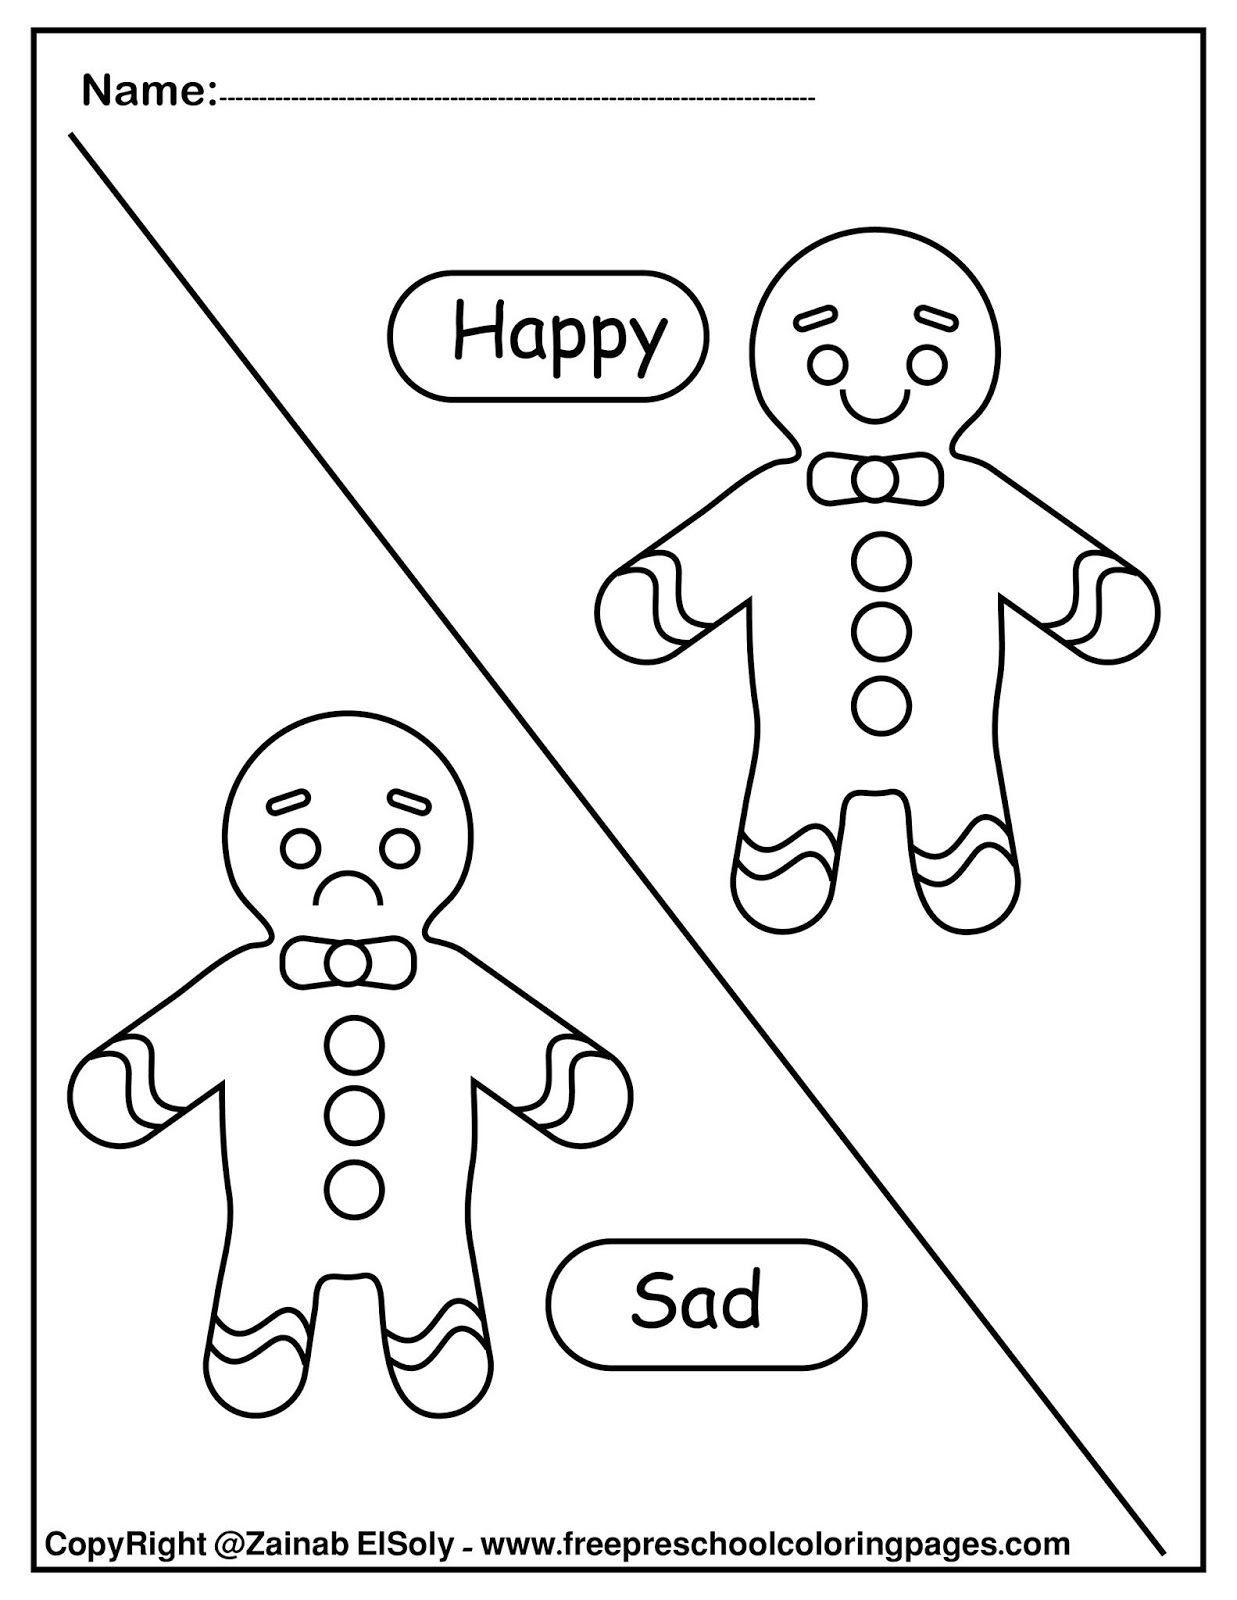 Set Of Gingerbread Man Opposites For Kids In